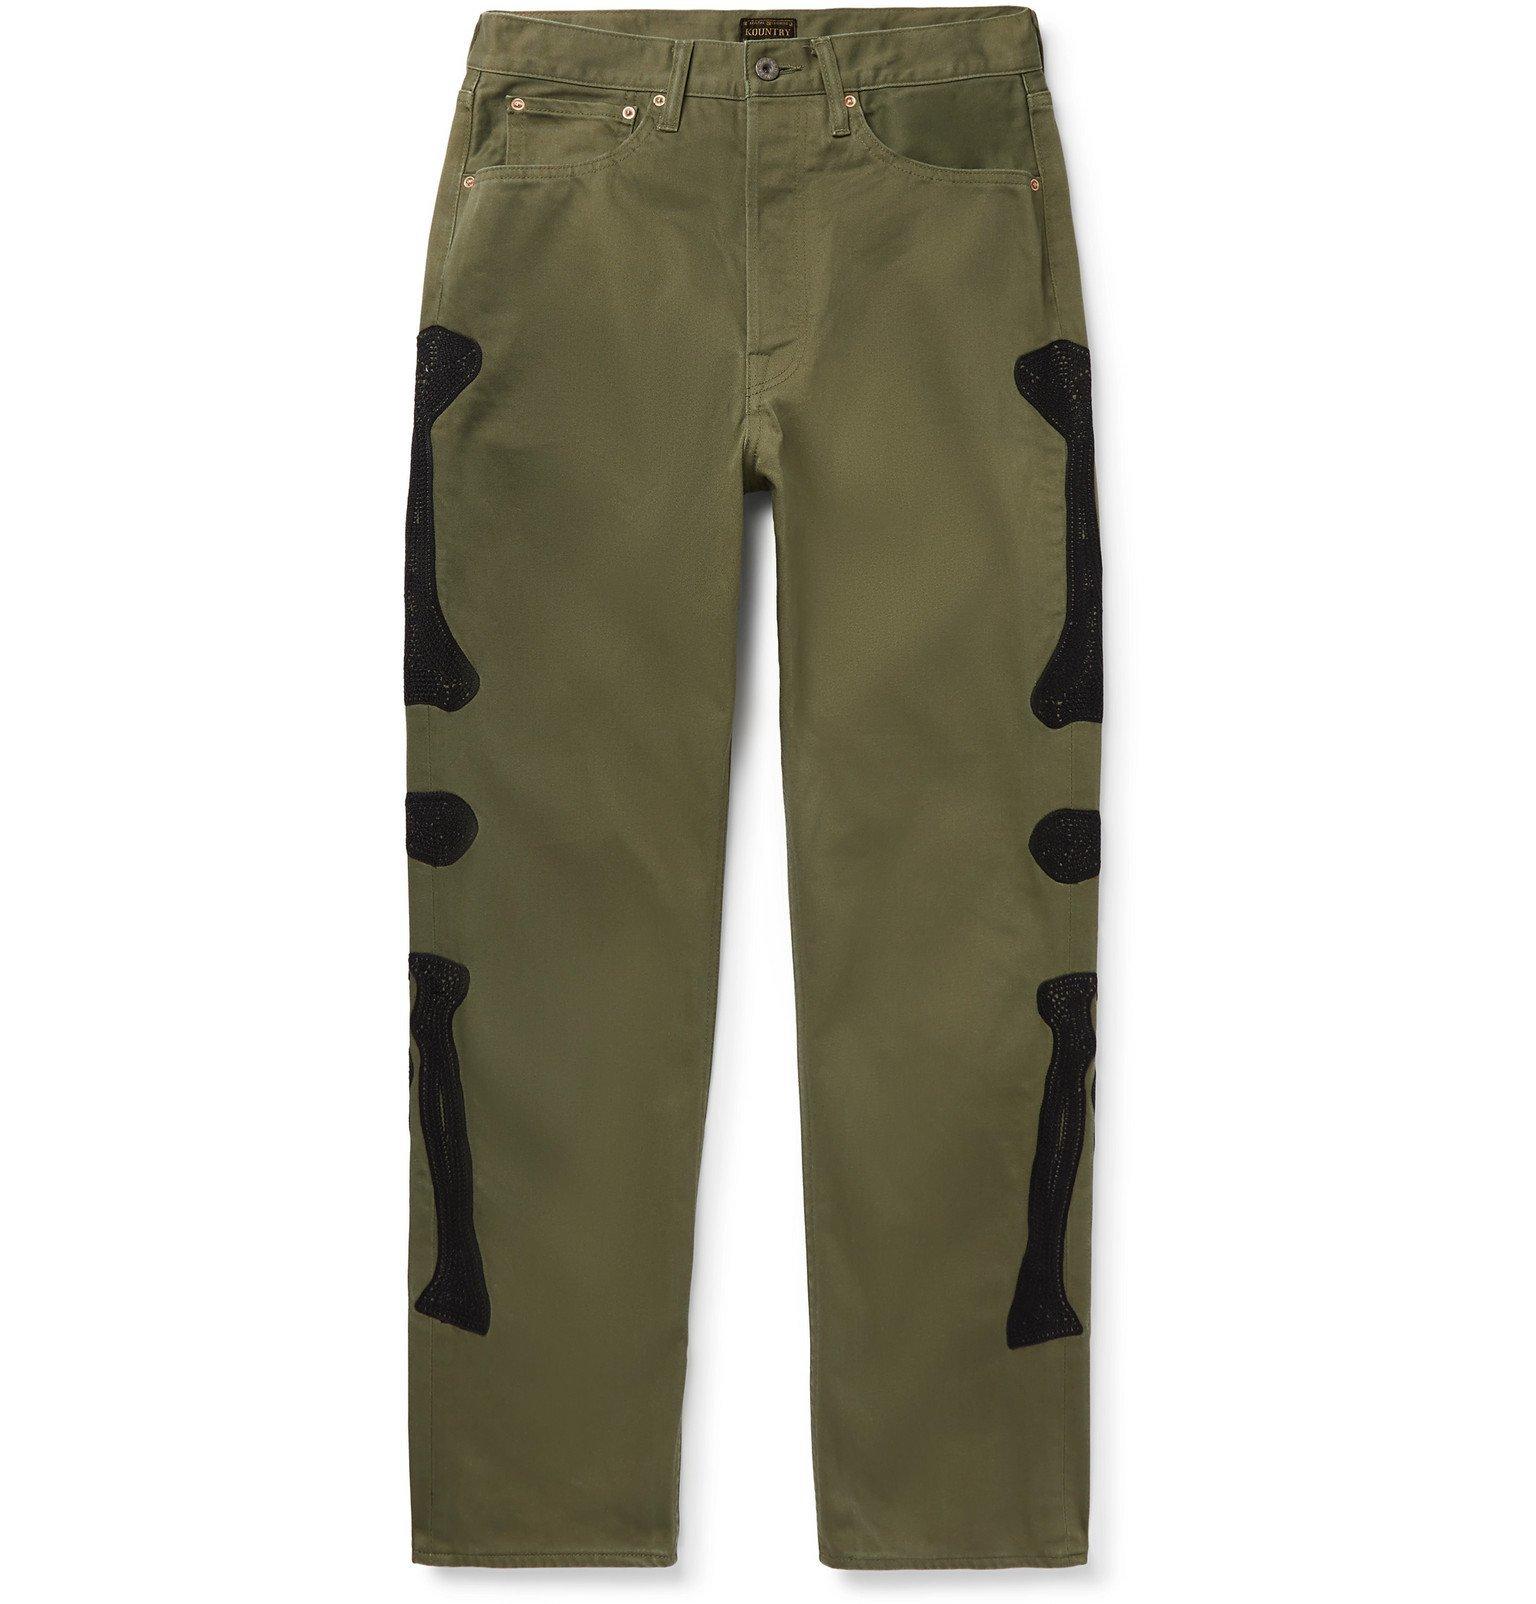 KAPITAL - Okagilly Slim-Fit Appliquéd Denim Jeans - Green